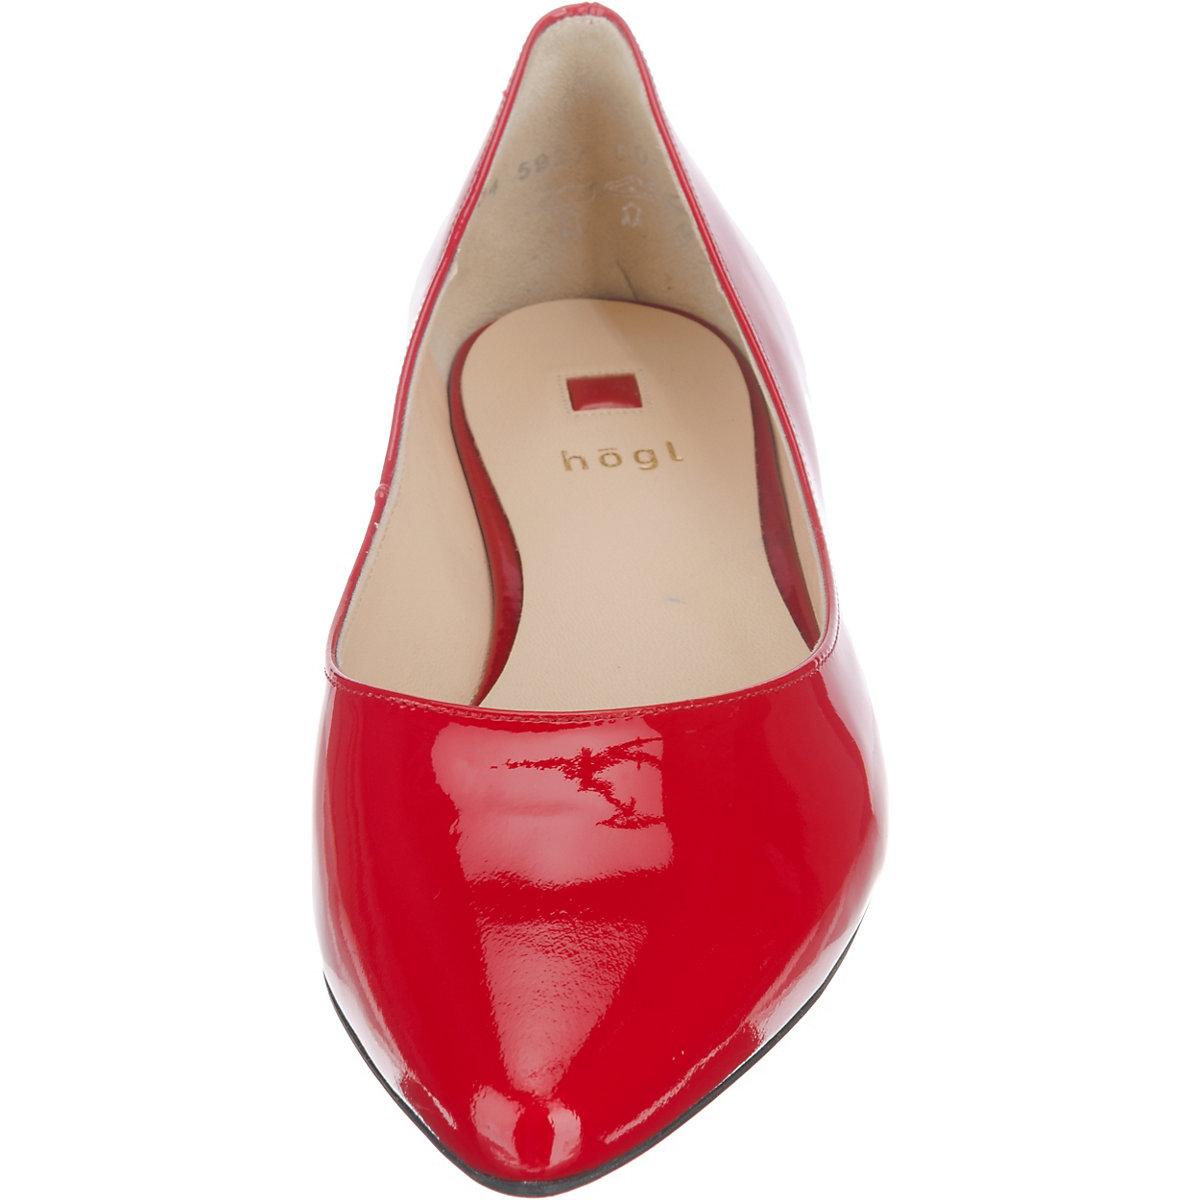 högl Klassische Ballerinas rot